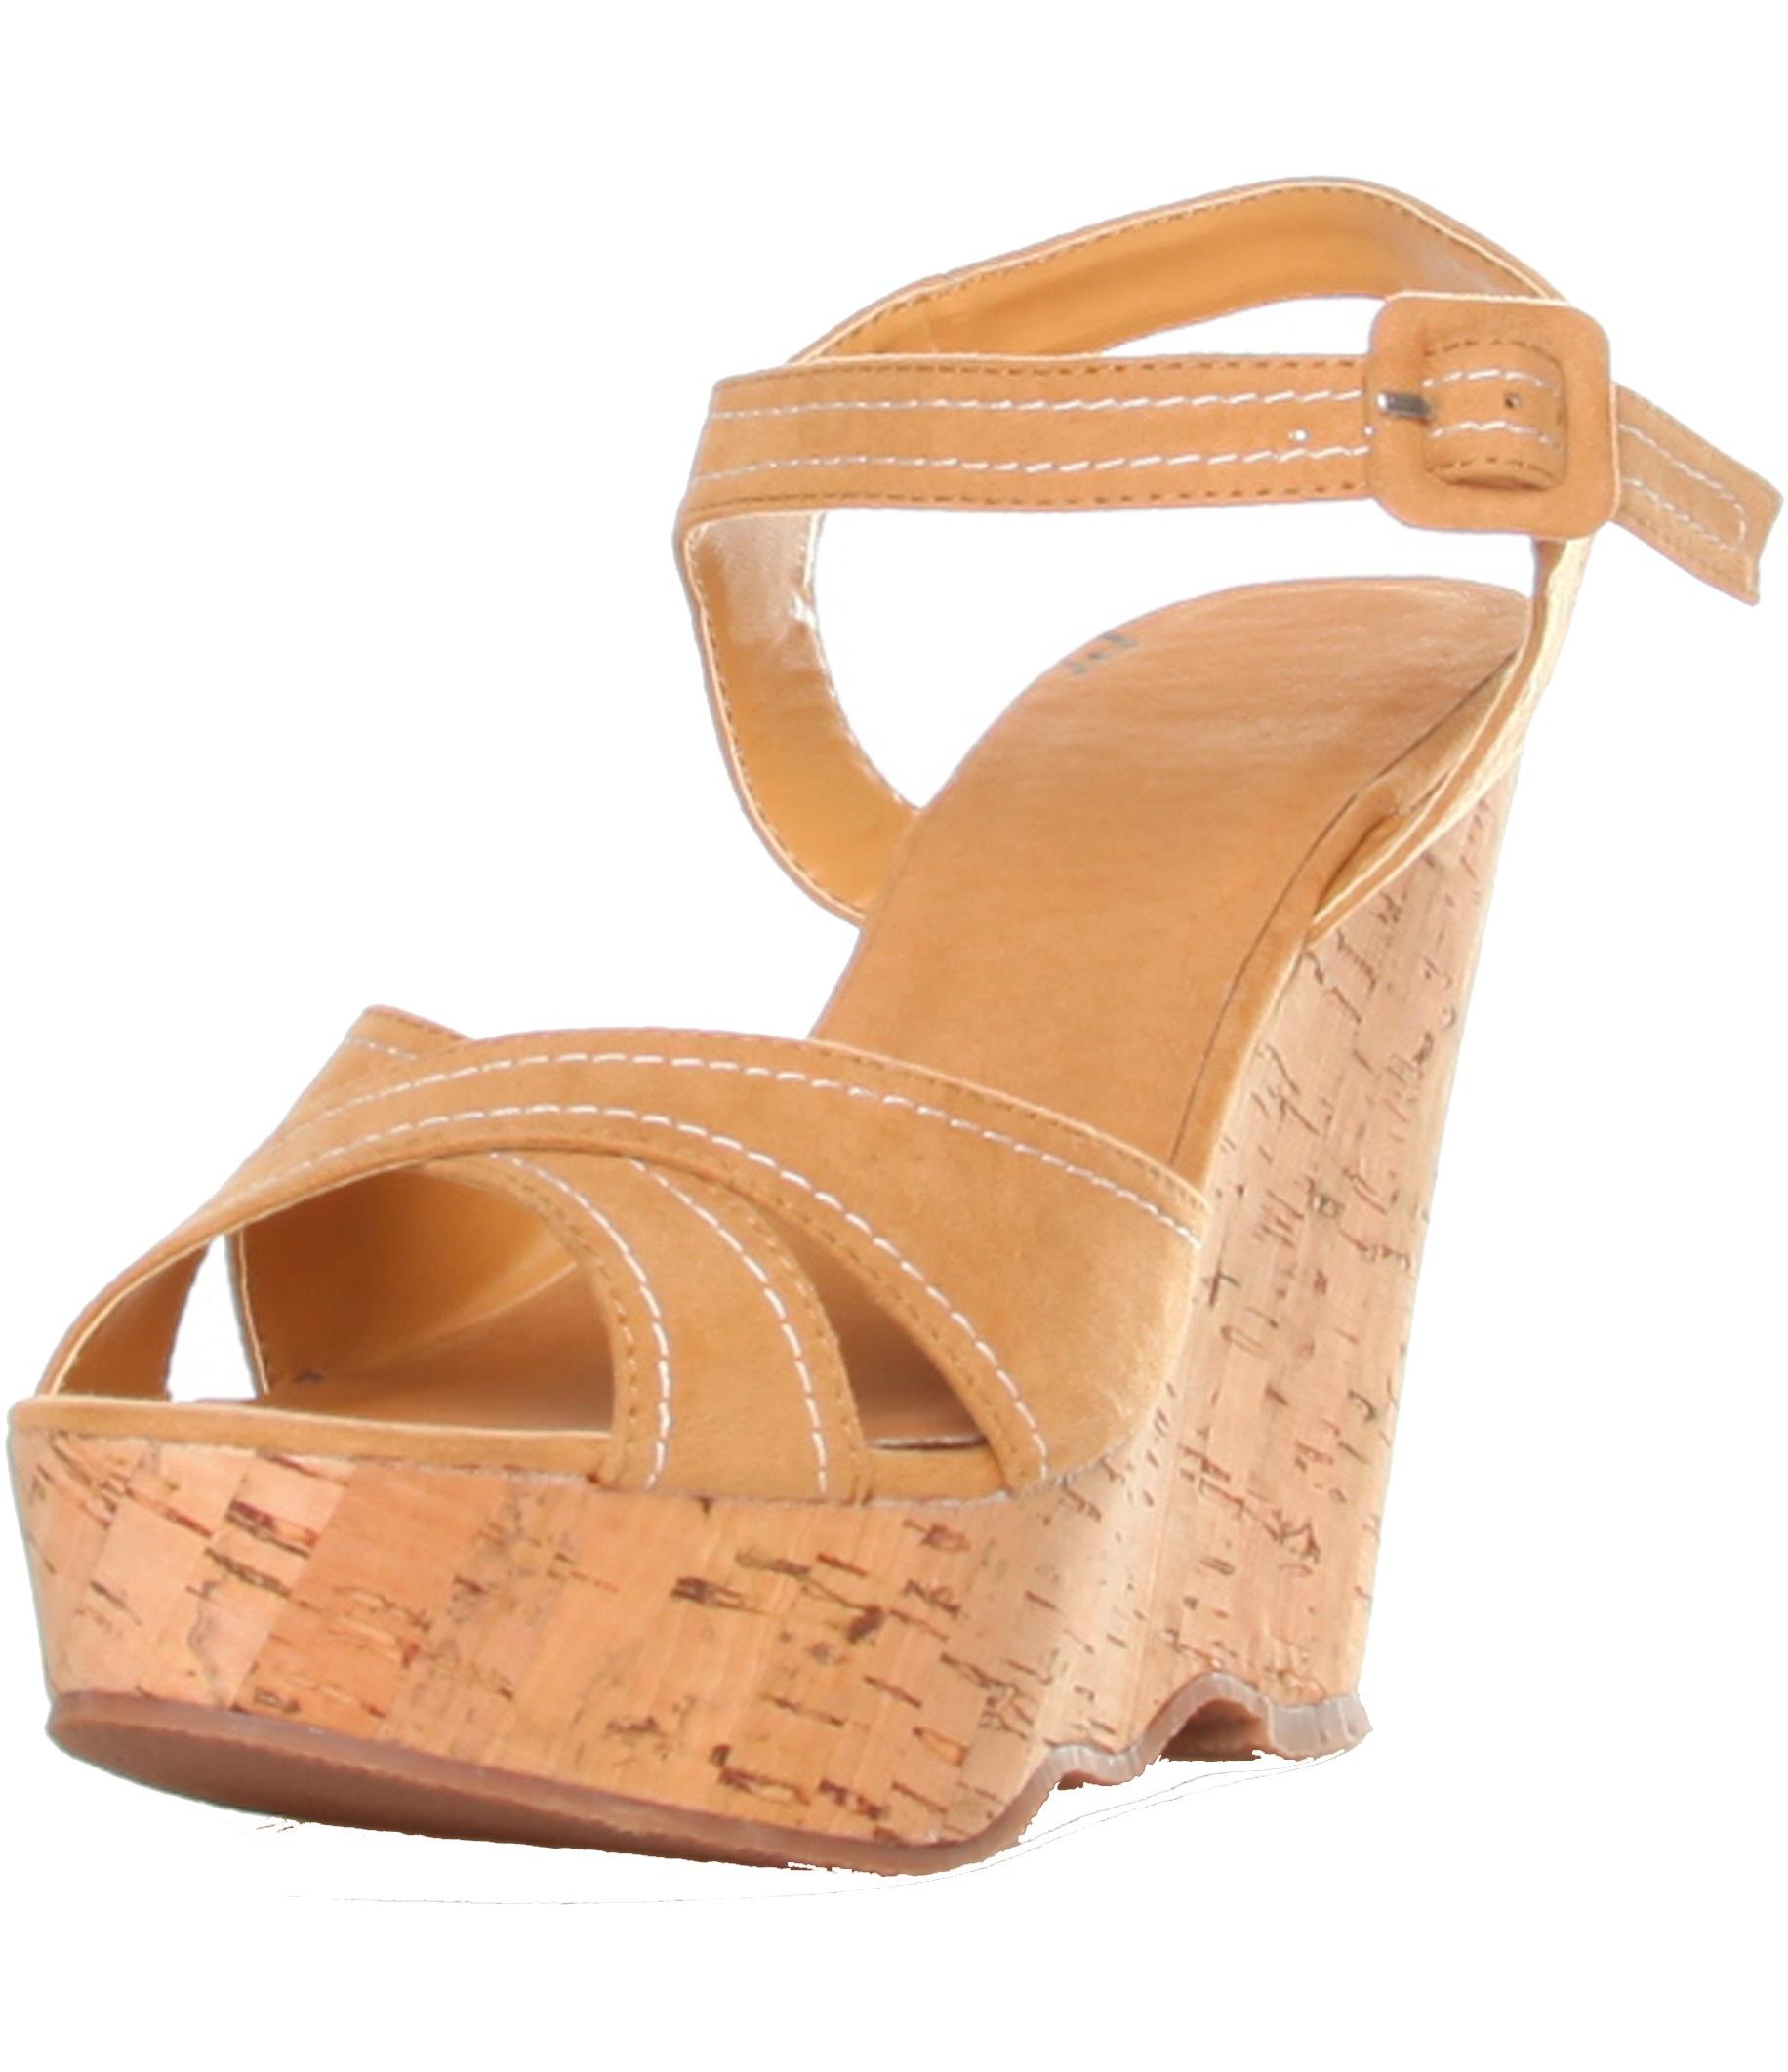 Ana Lublin Sandals Camel Rf600349